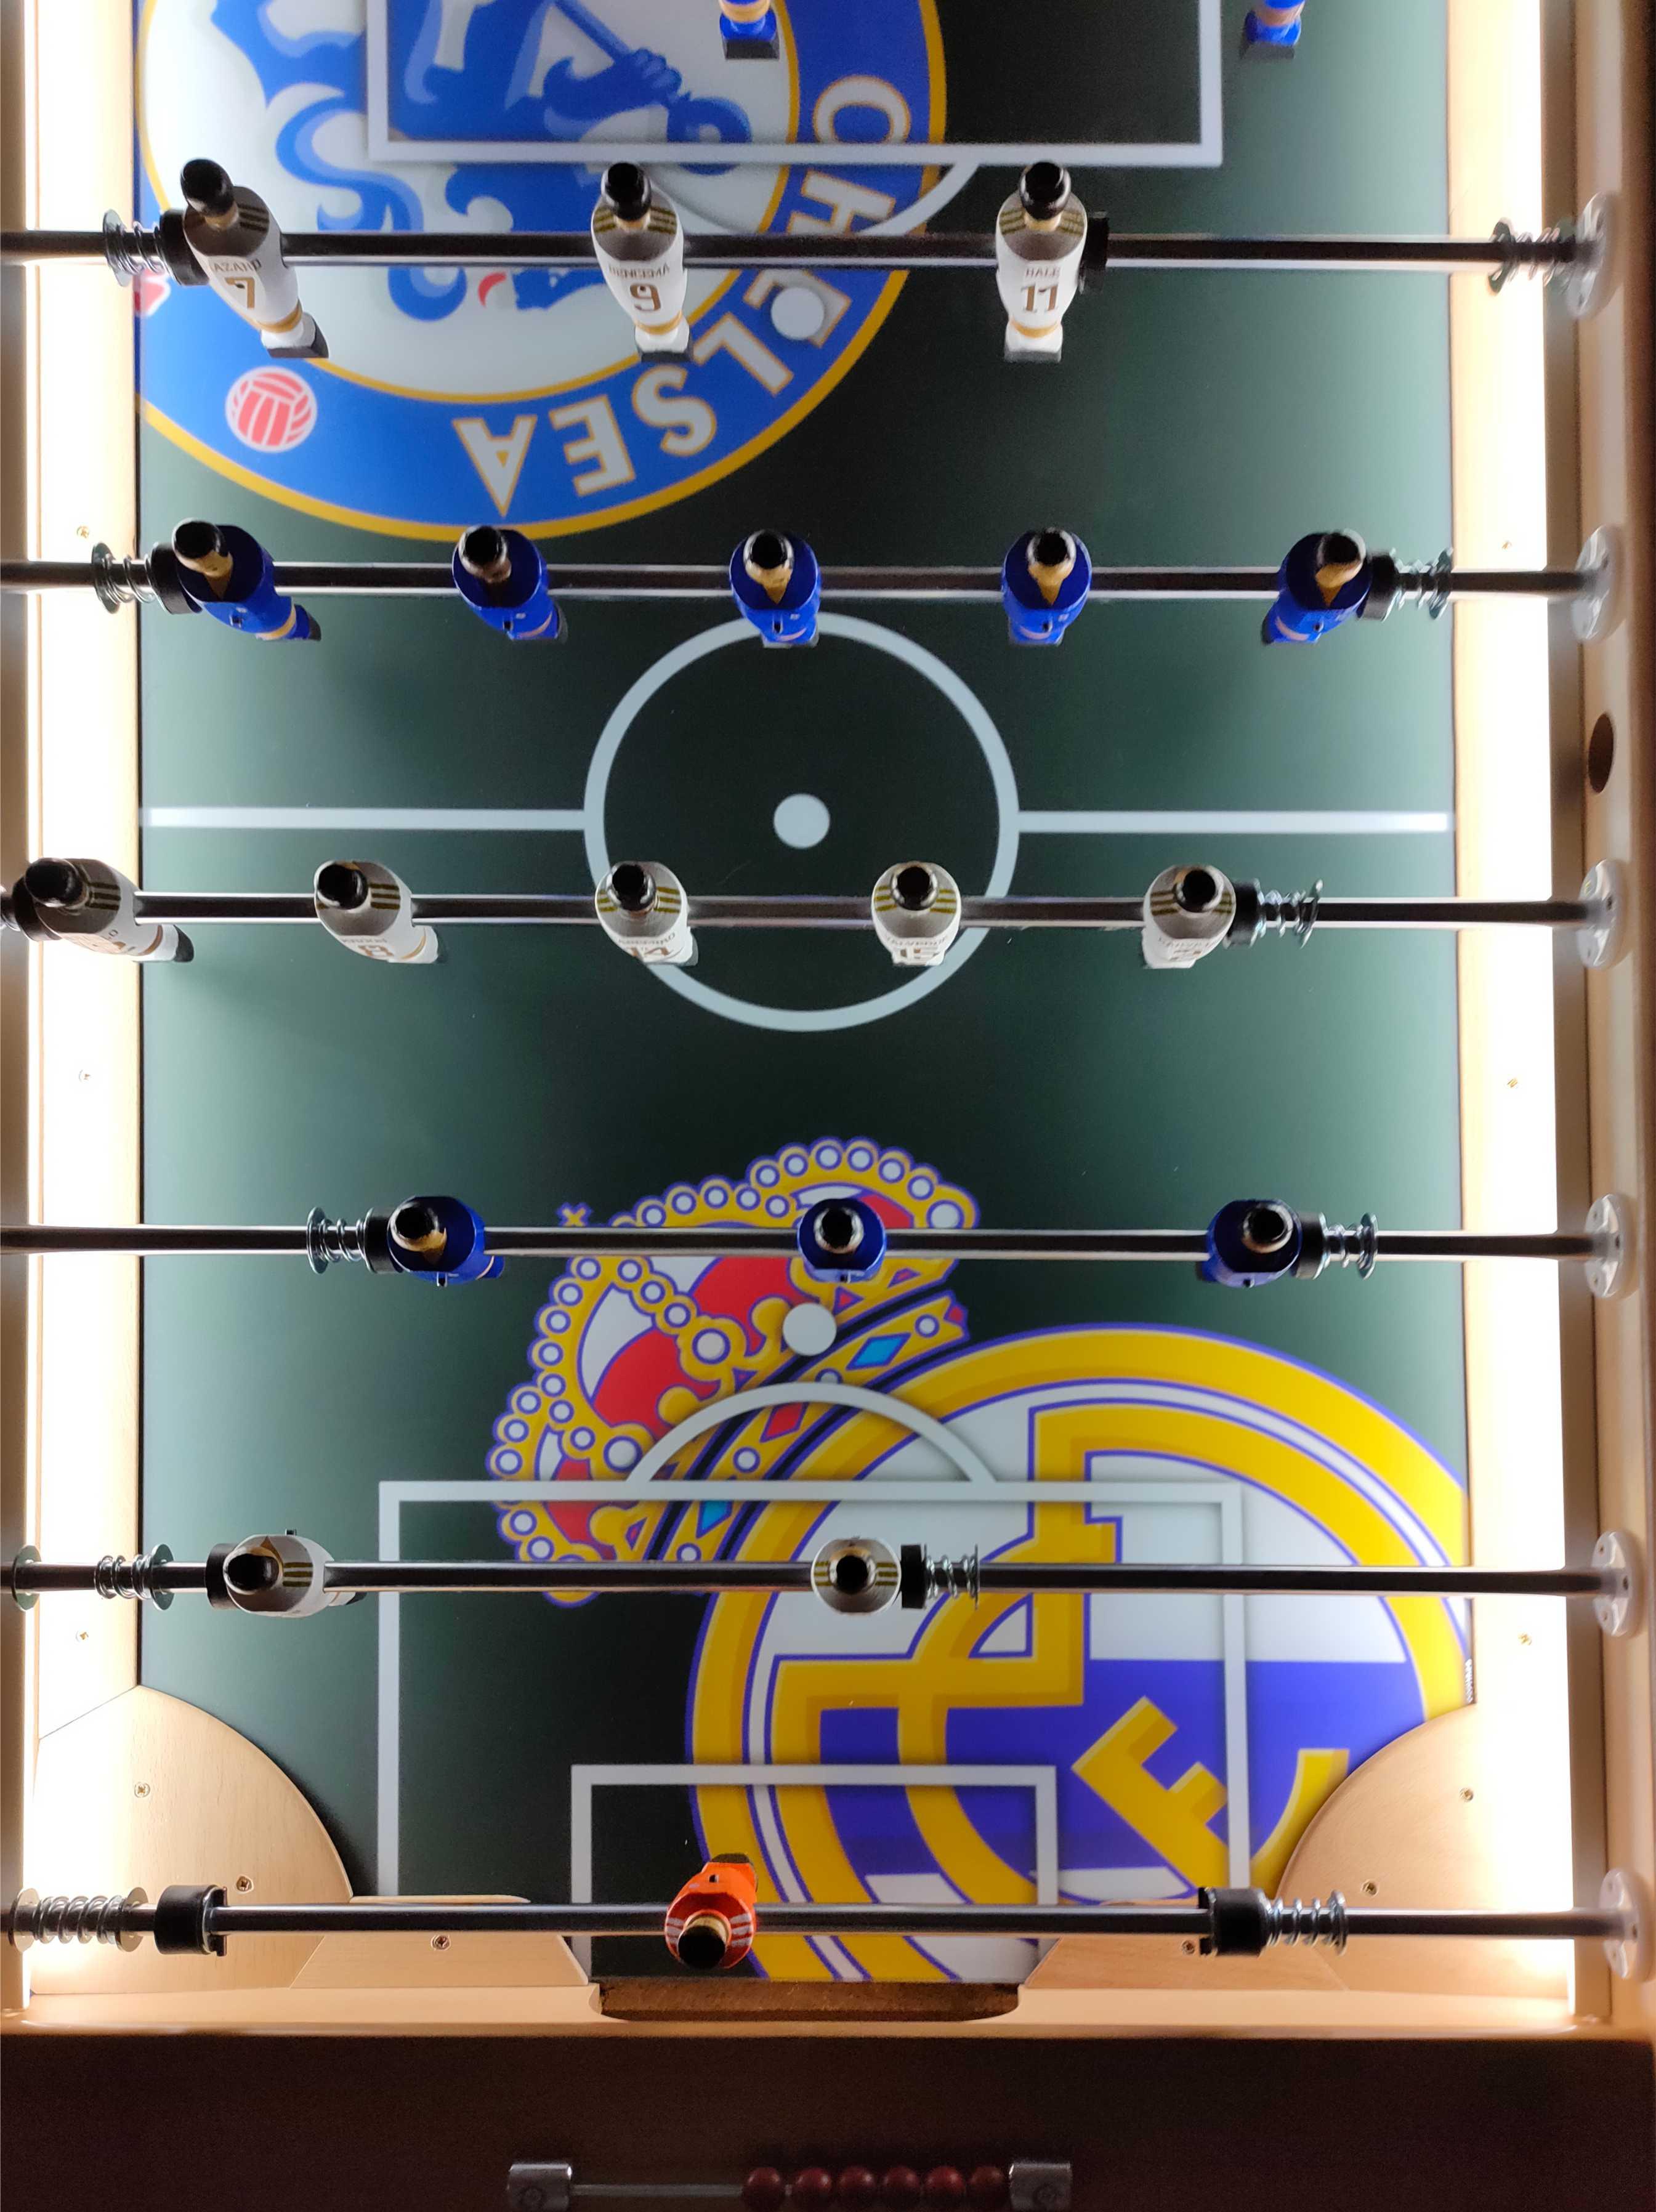 2_Futbolin-Real-Madrid-Chelsea-7